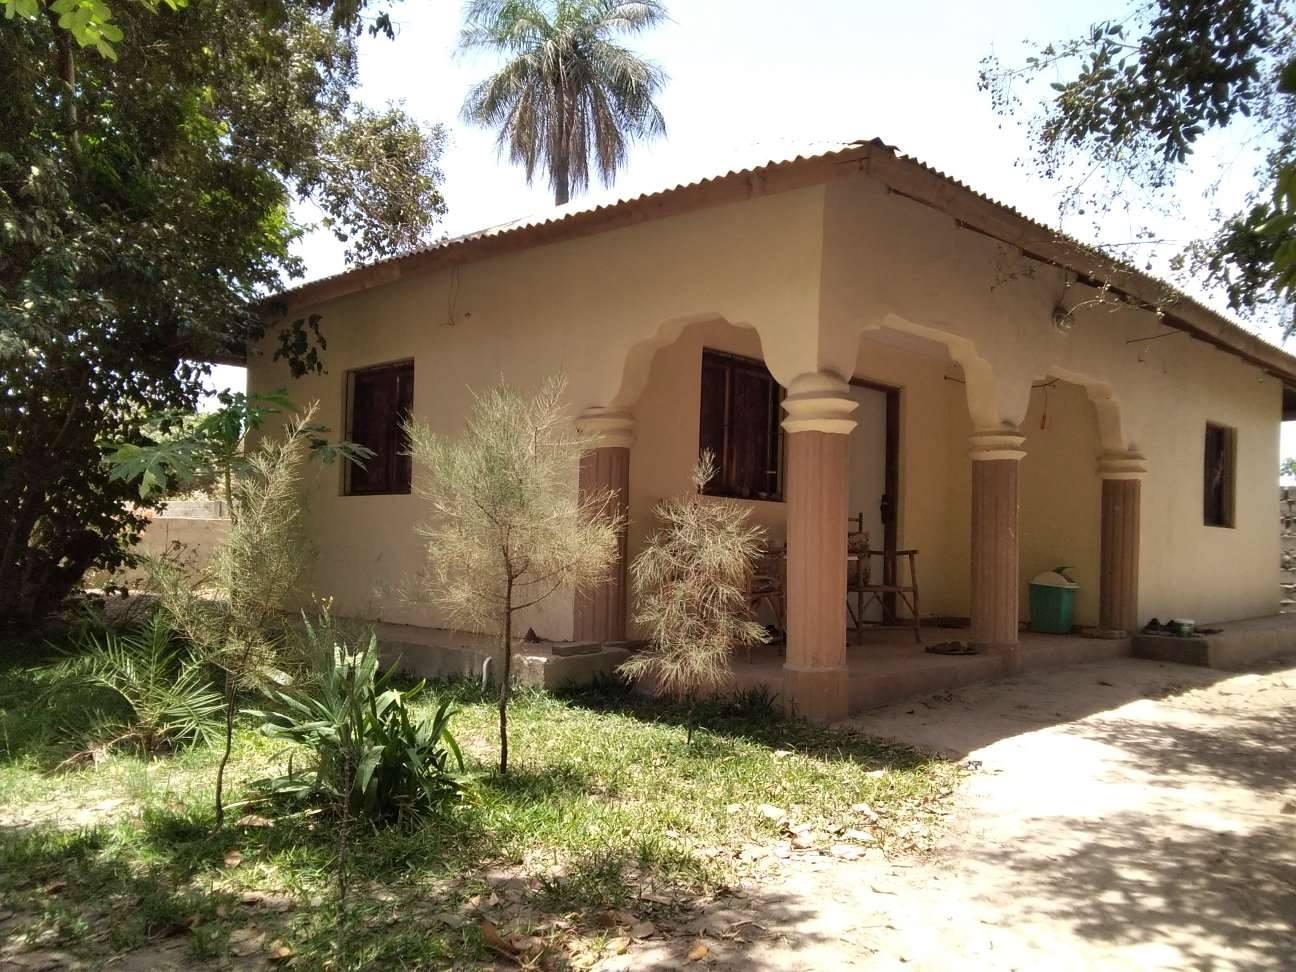 Nuha's Homestay Lodge